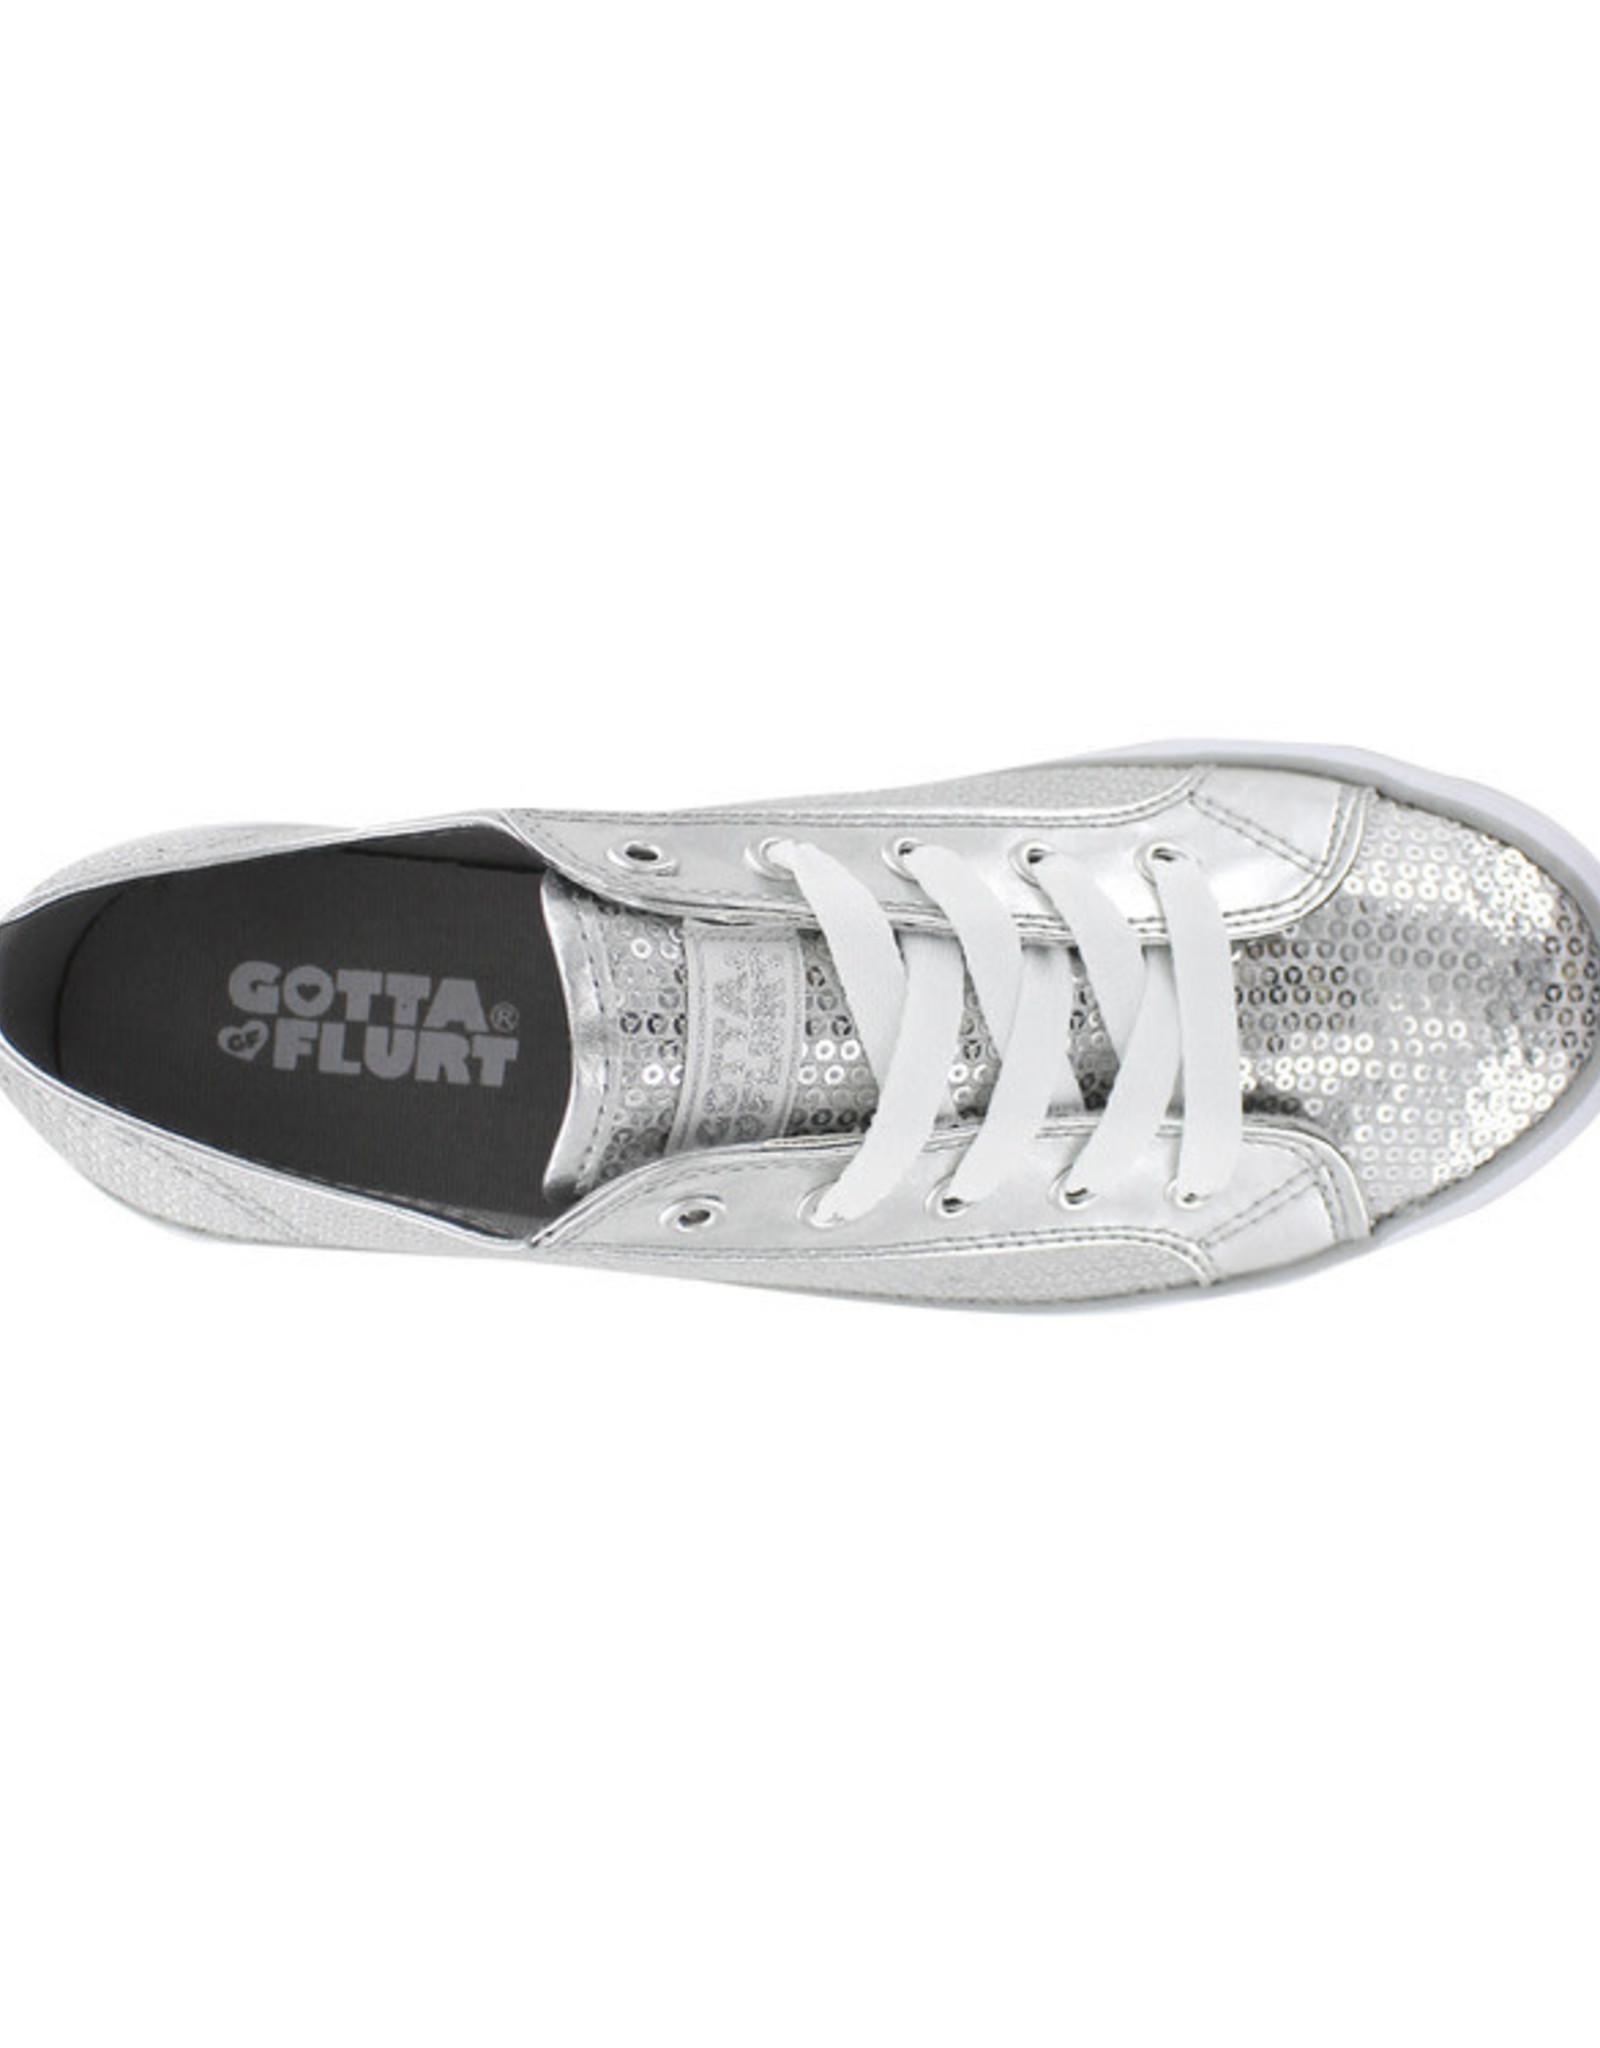 Gotta Flirt  Disco II Dance Sneakers